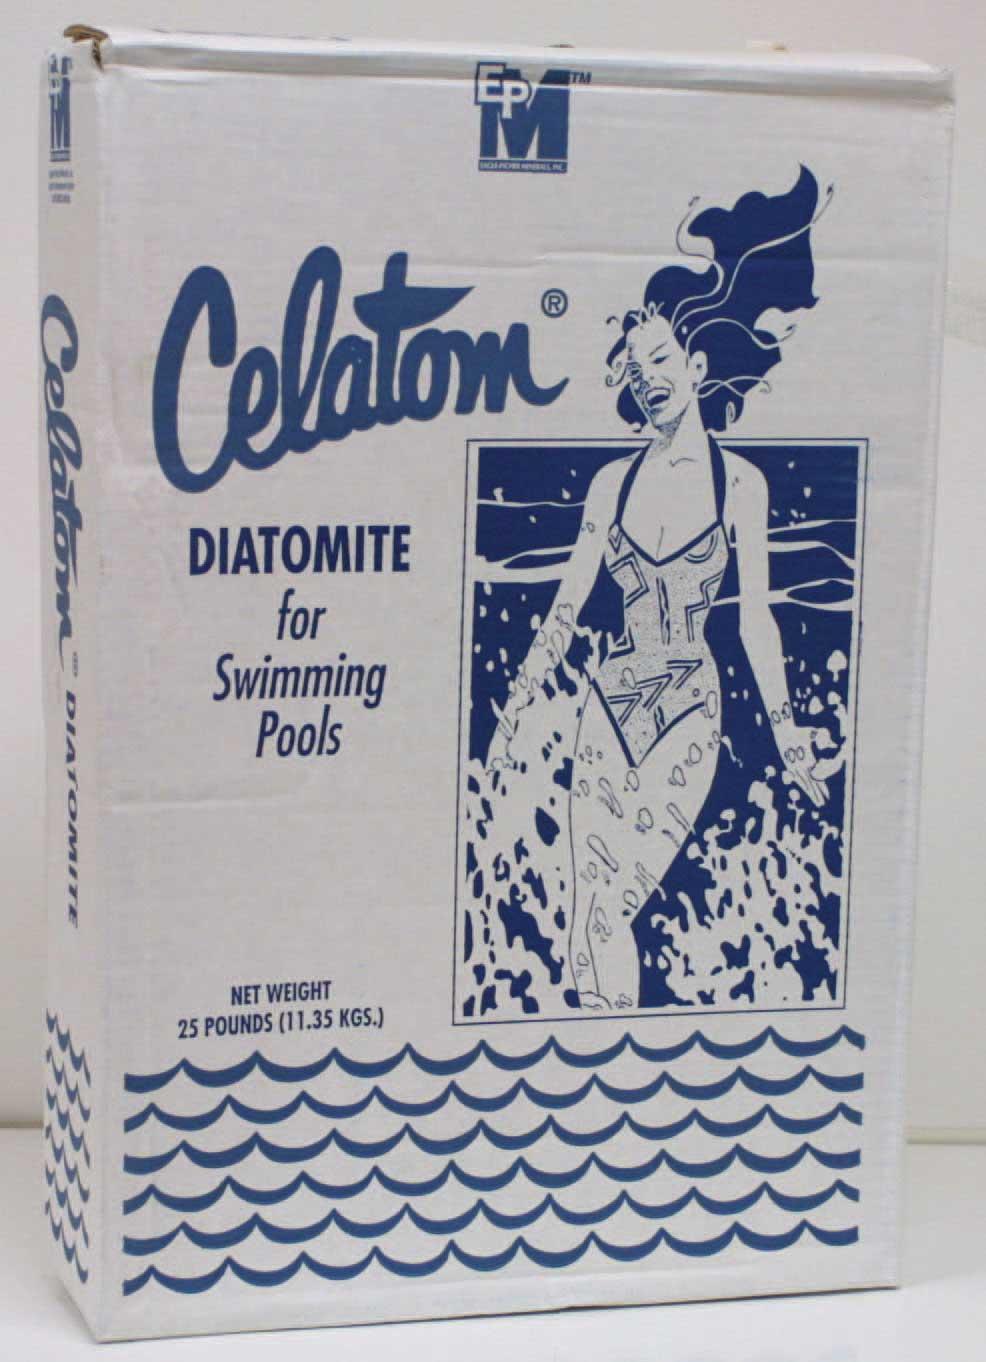 Celatom filter aid diatomite for swimming pools 8826 ebay - Diatomite filter media for swimming pools ...